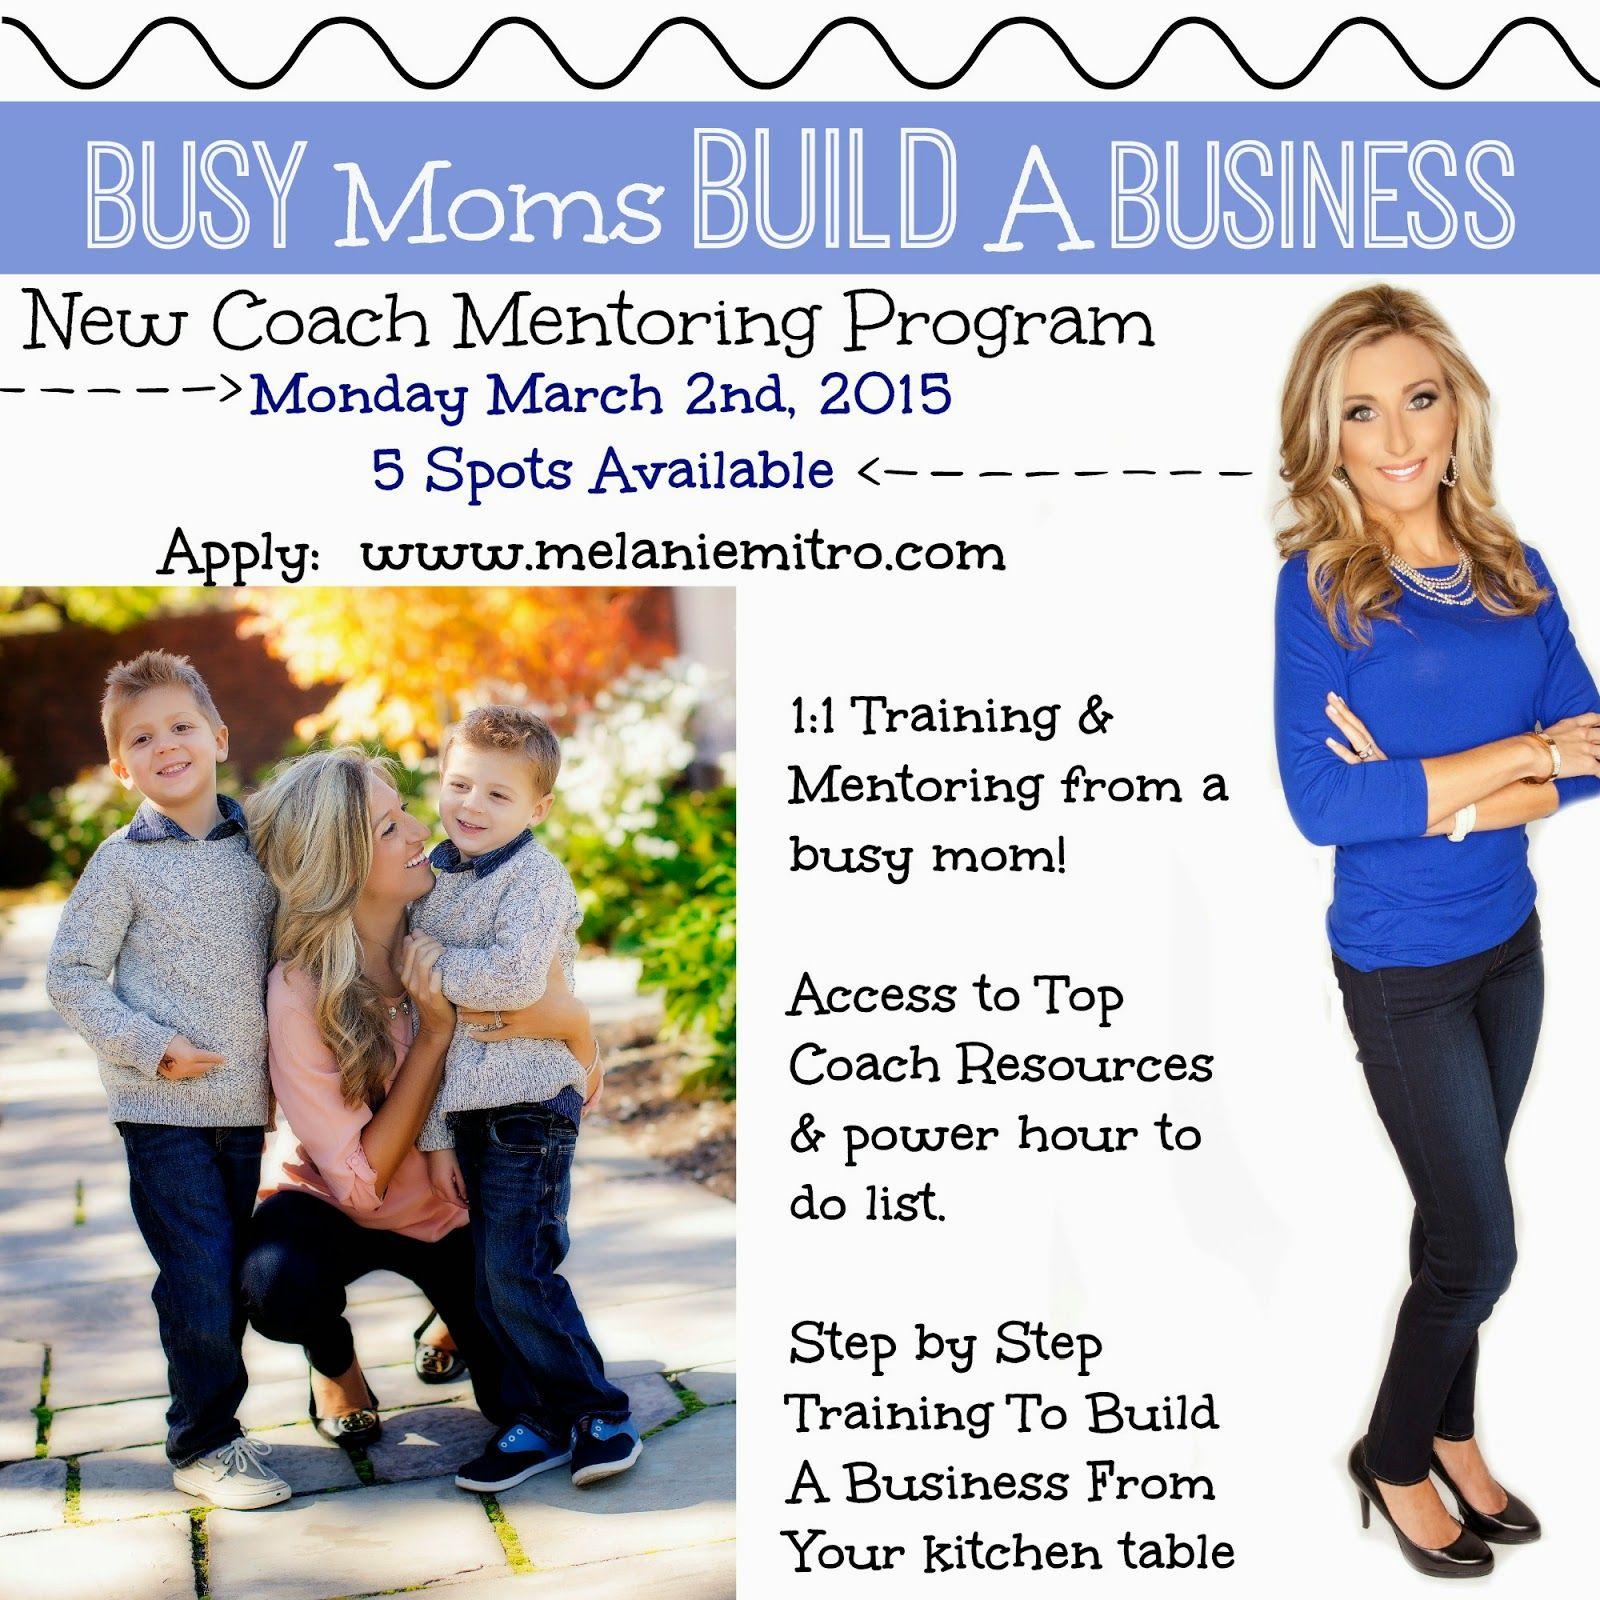 Busy Moms Build A Business Team Beachbody Coaching Top Coach